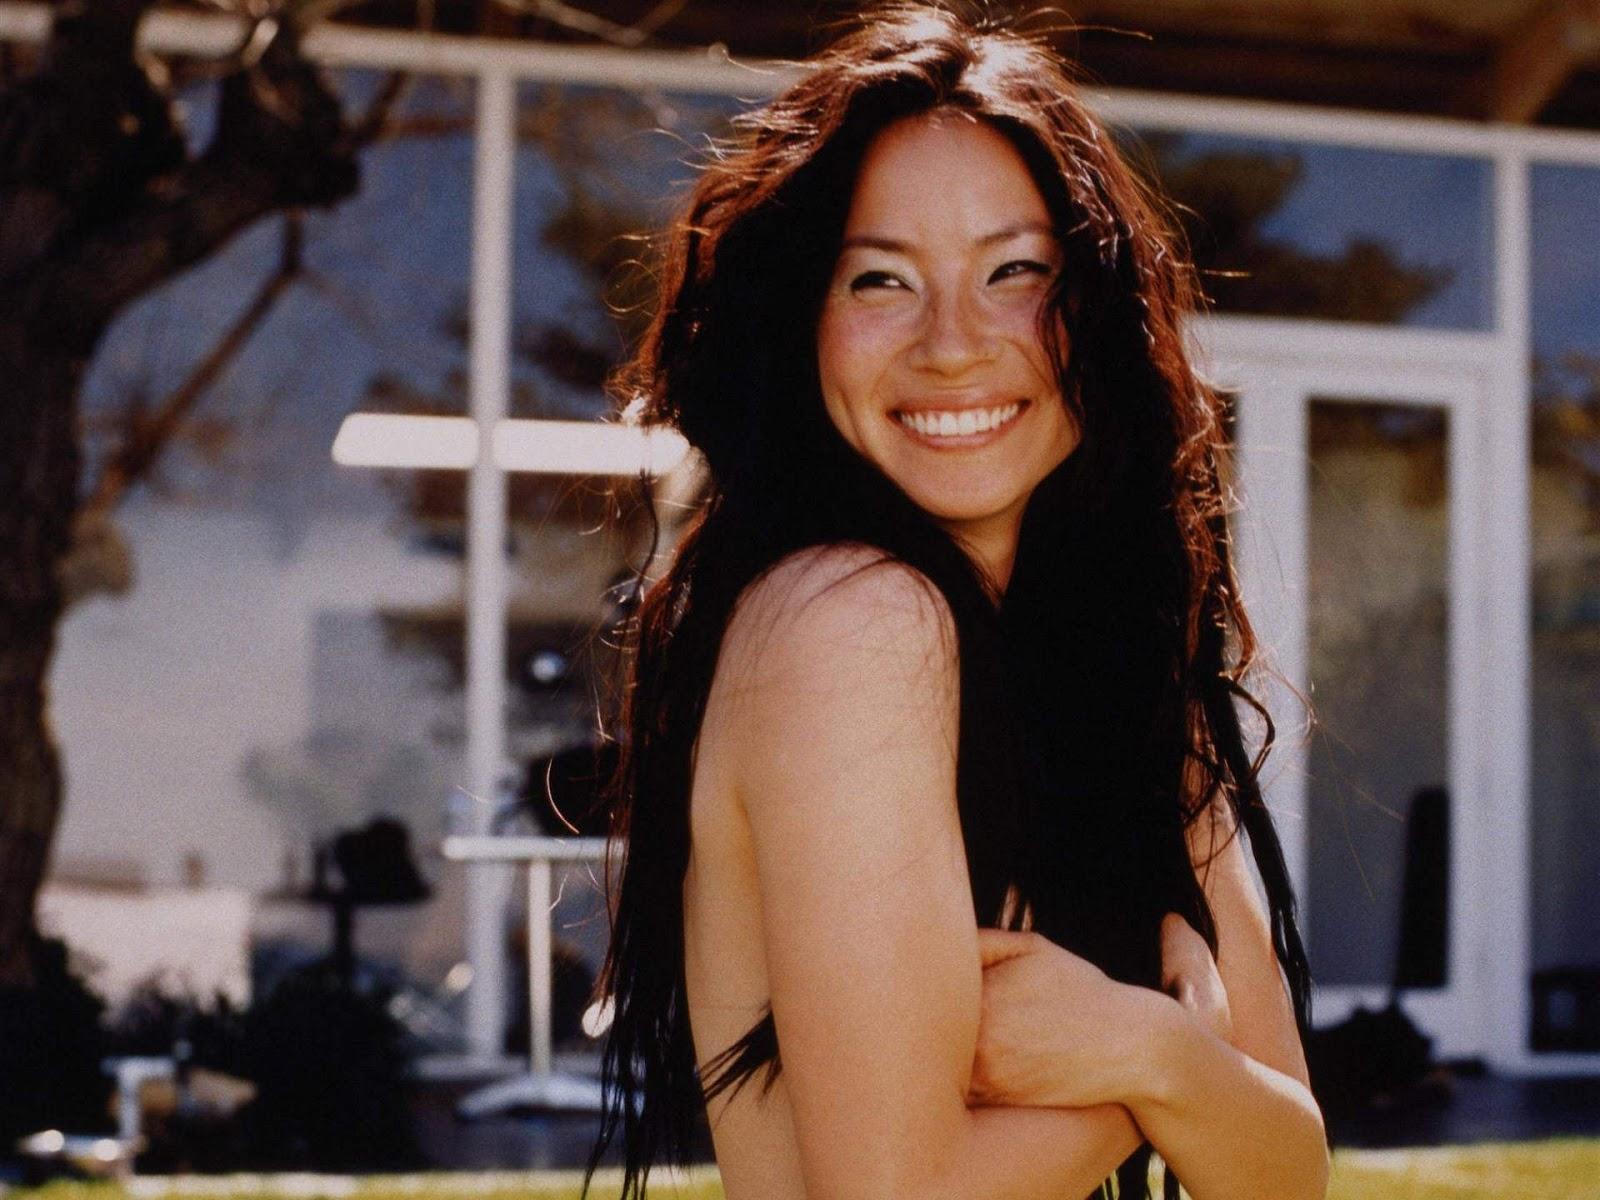 Hot Cecilia Liu nude (49 photo) Video, Instagram, lingerie